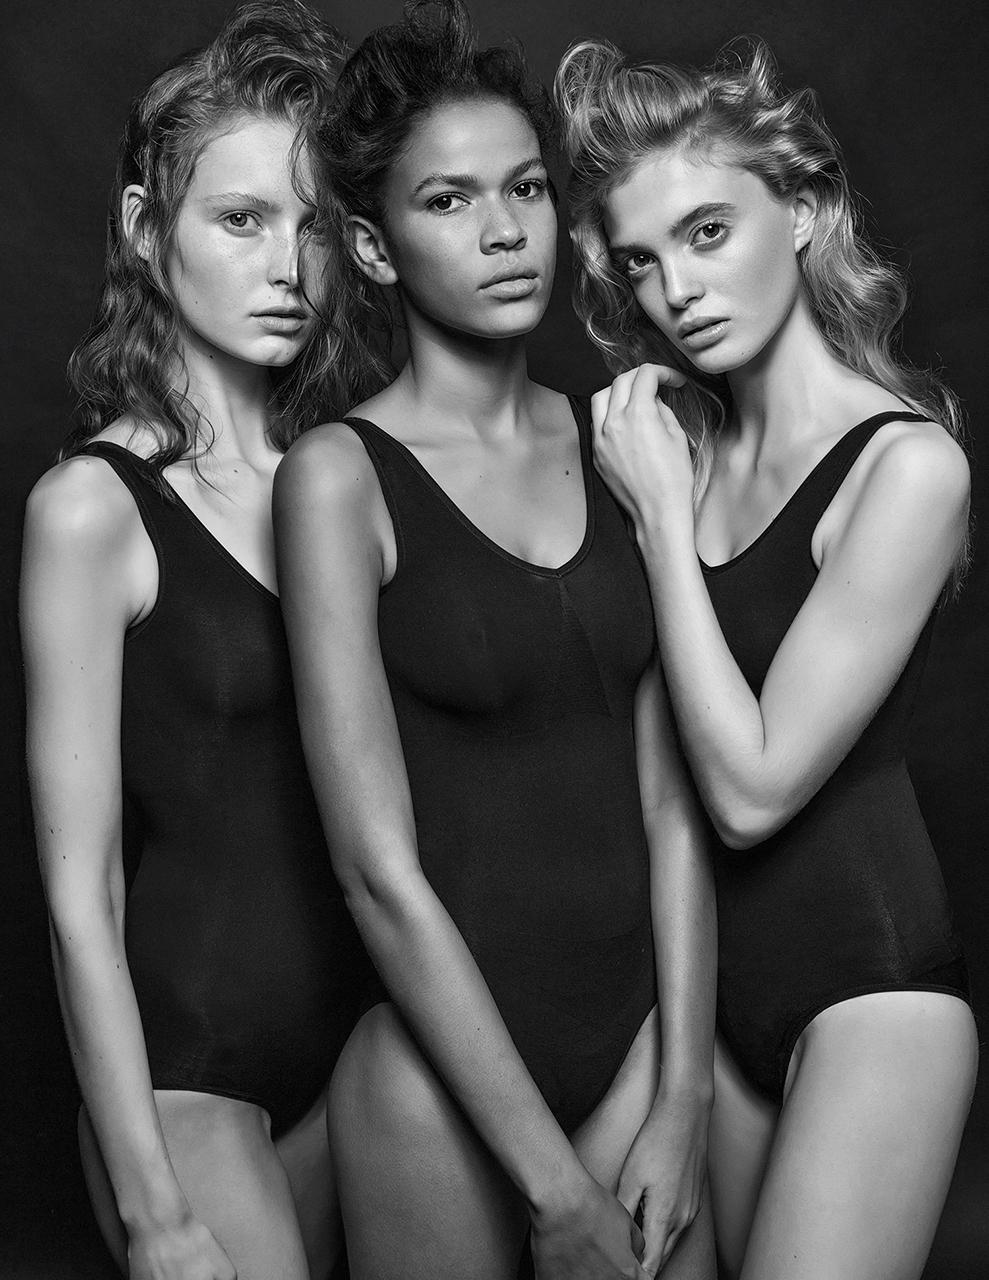 Harper's Bazaar Beauty group (5).jpg